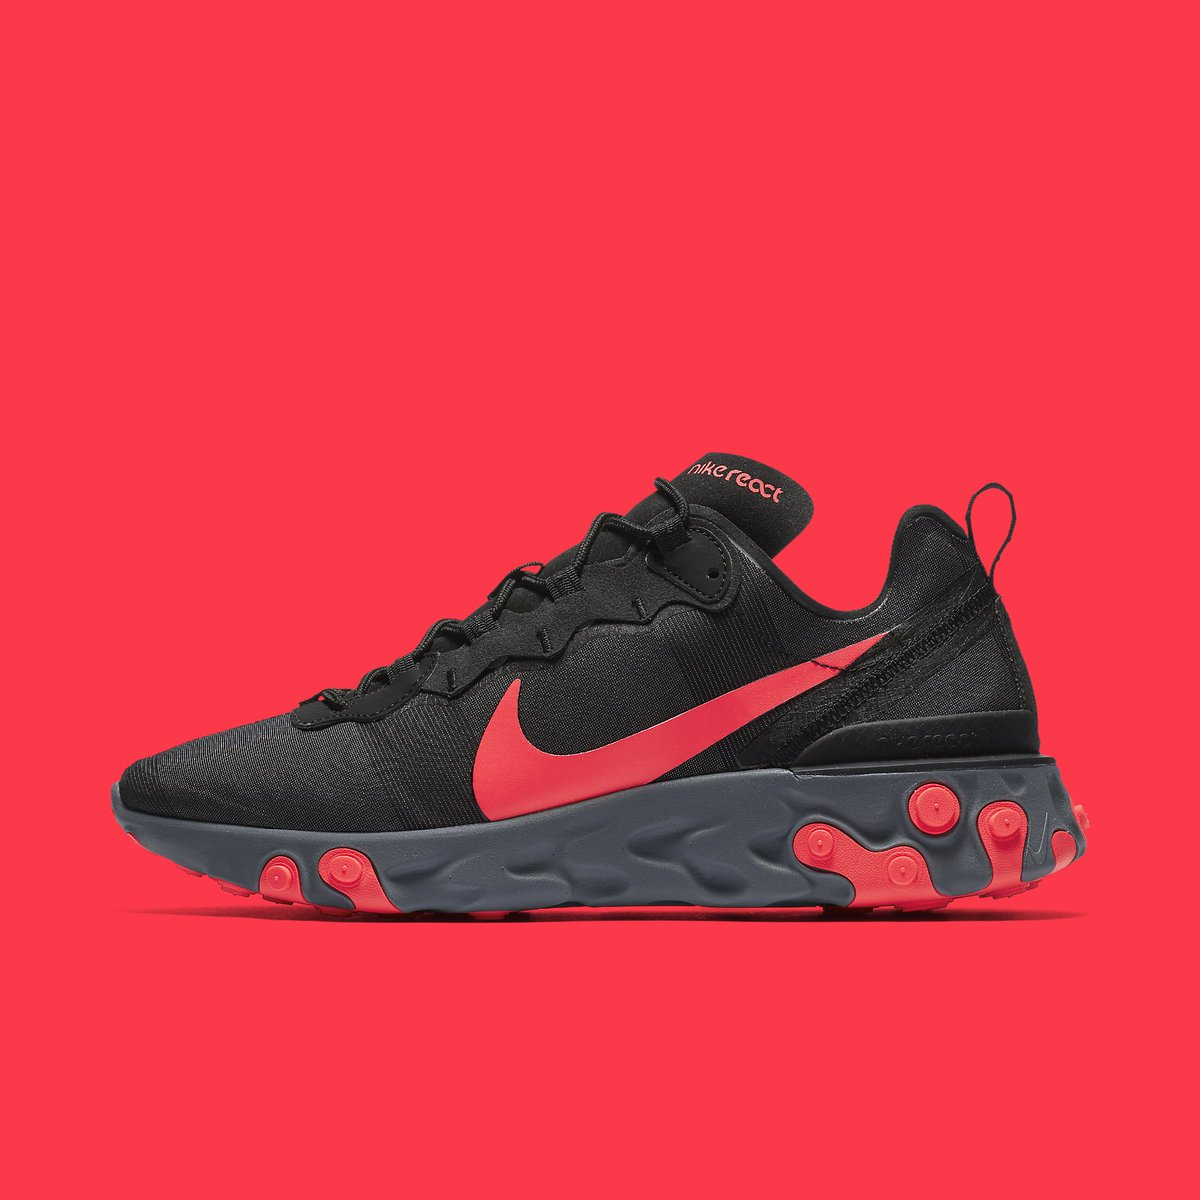 924995b6643cf6 The Nike React Element 55 will release on September 29 for  130 each.pic. twitter.com 3hLVaehFNM